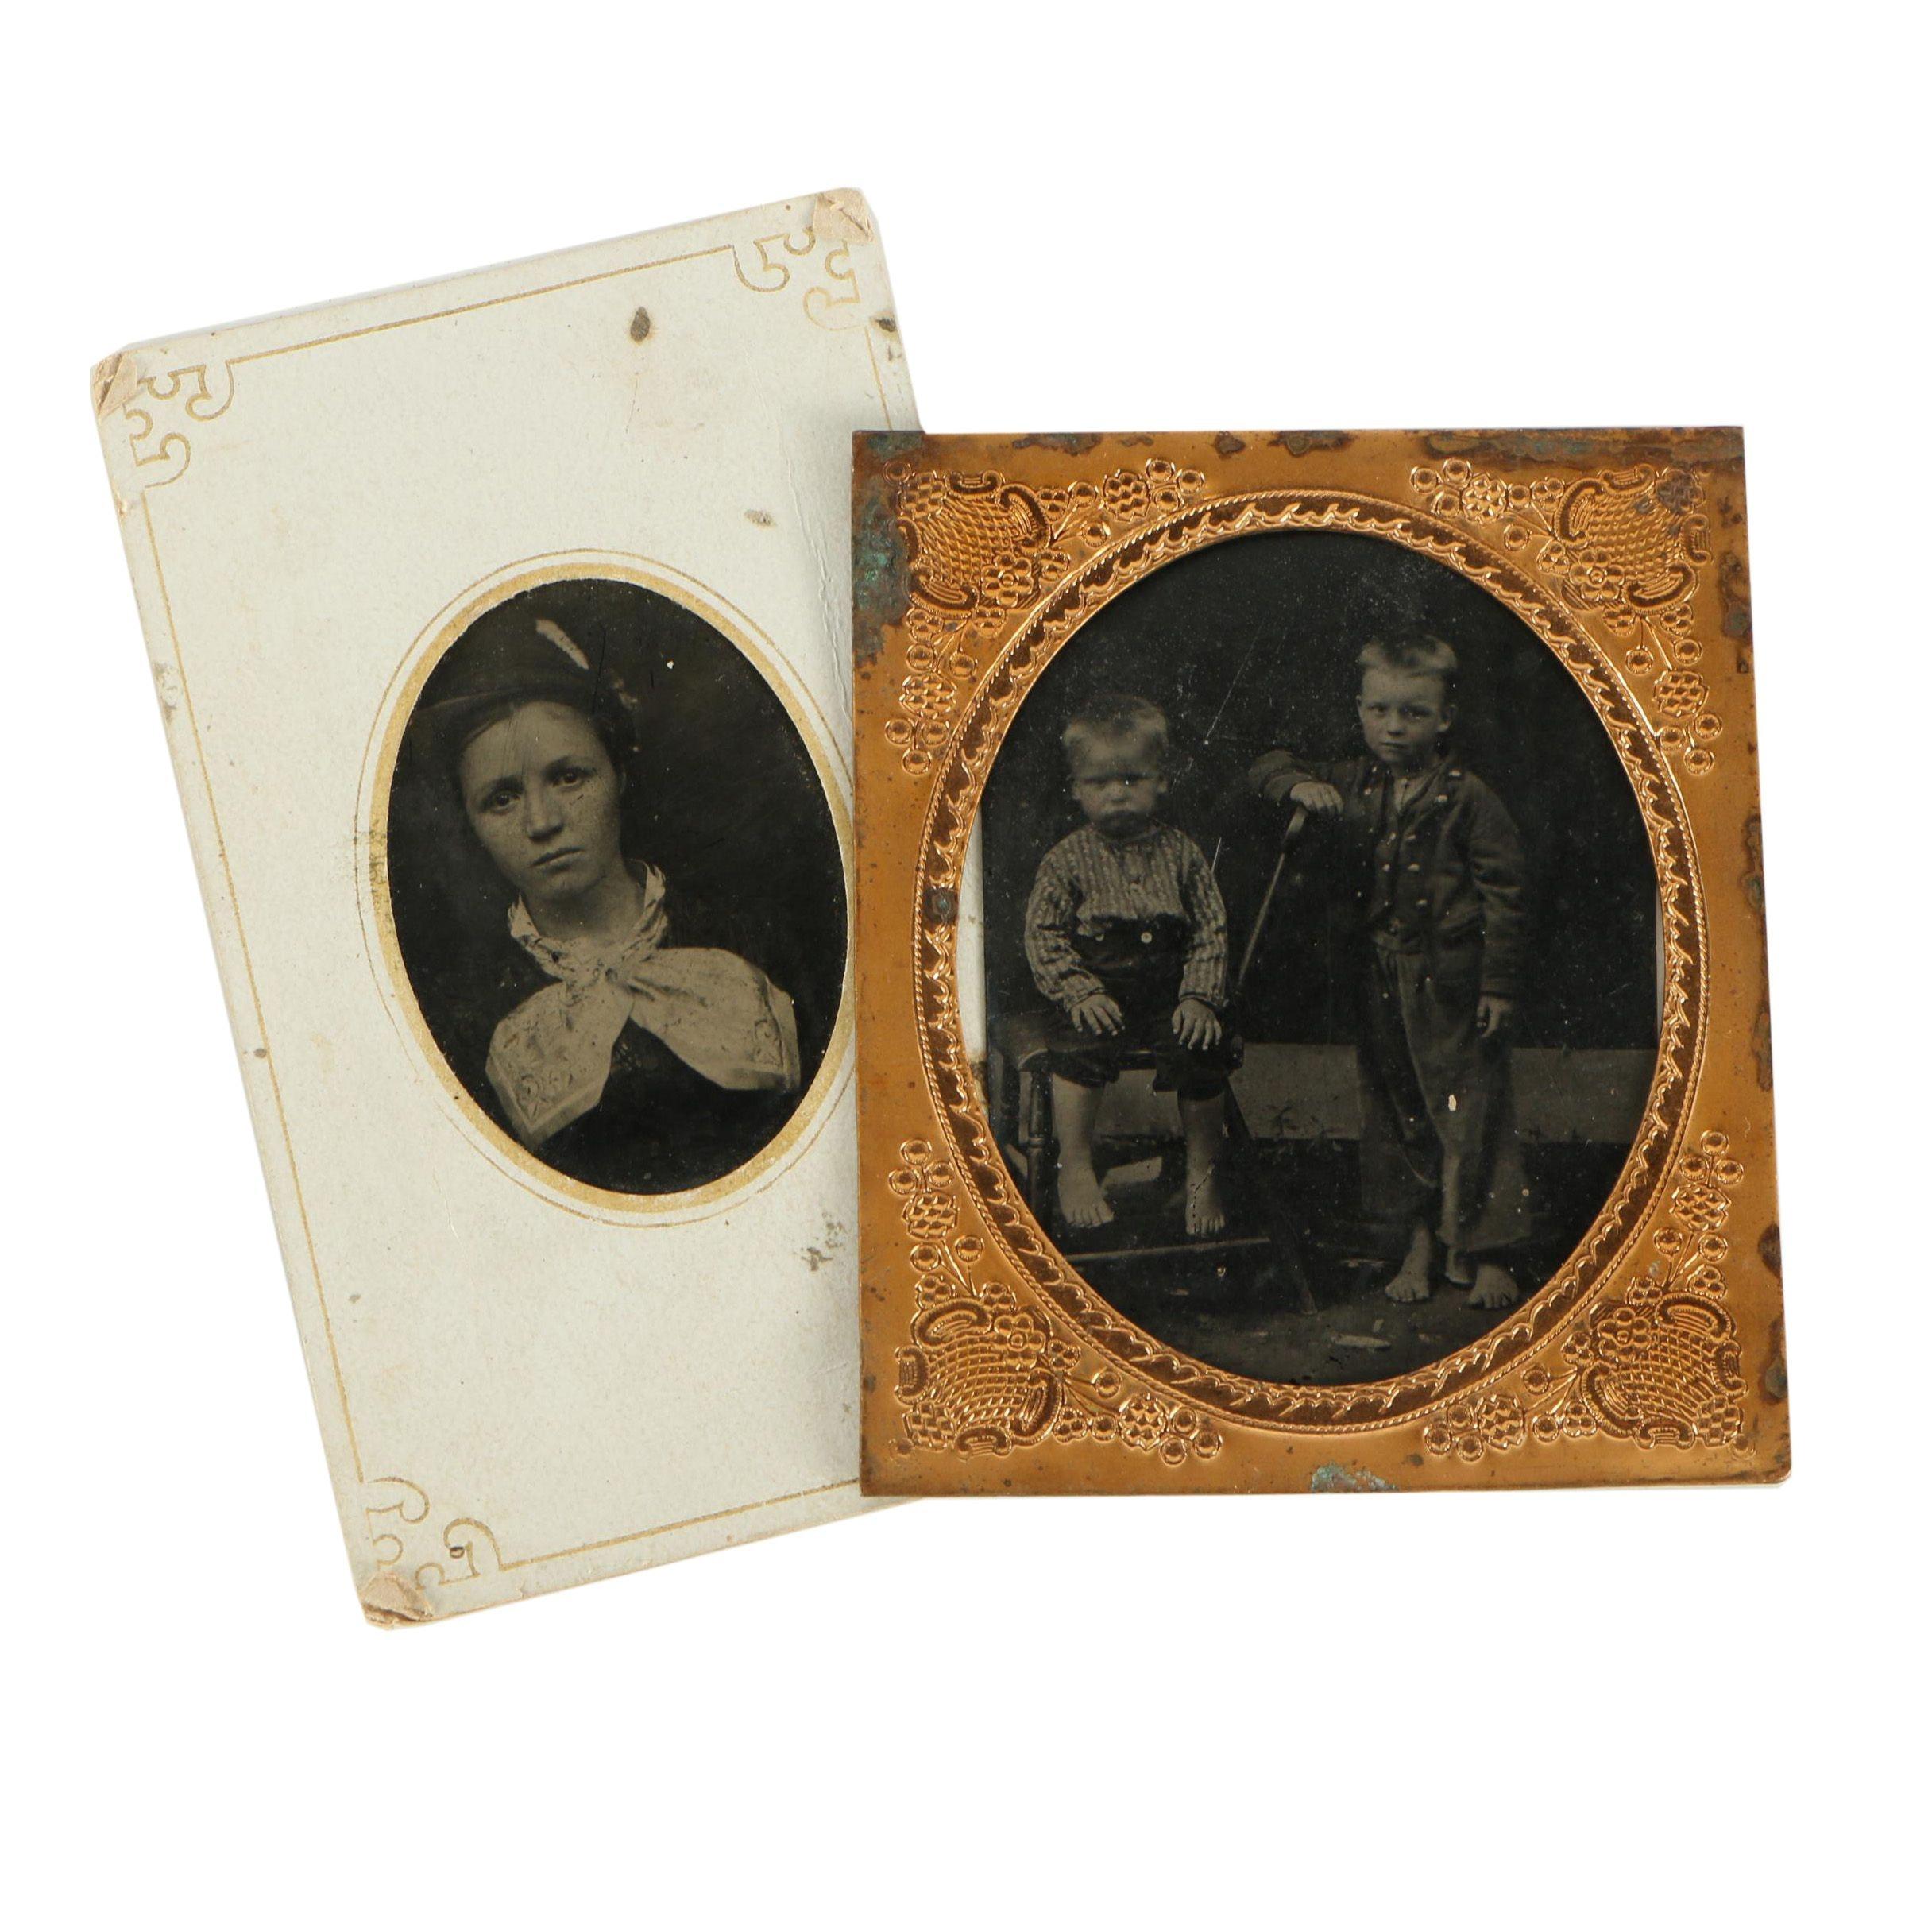 Antique 19th-Century Tintype Photographs